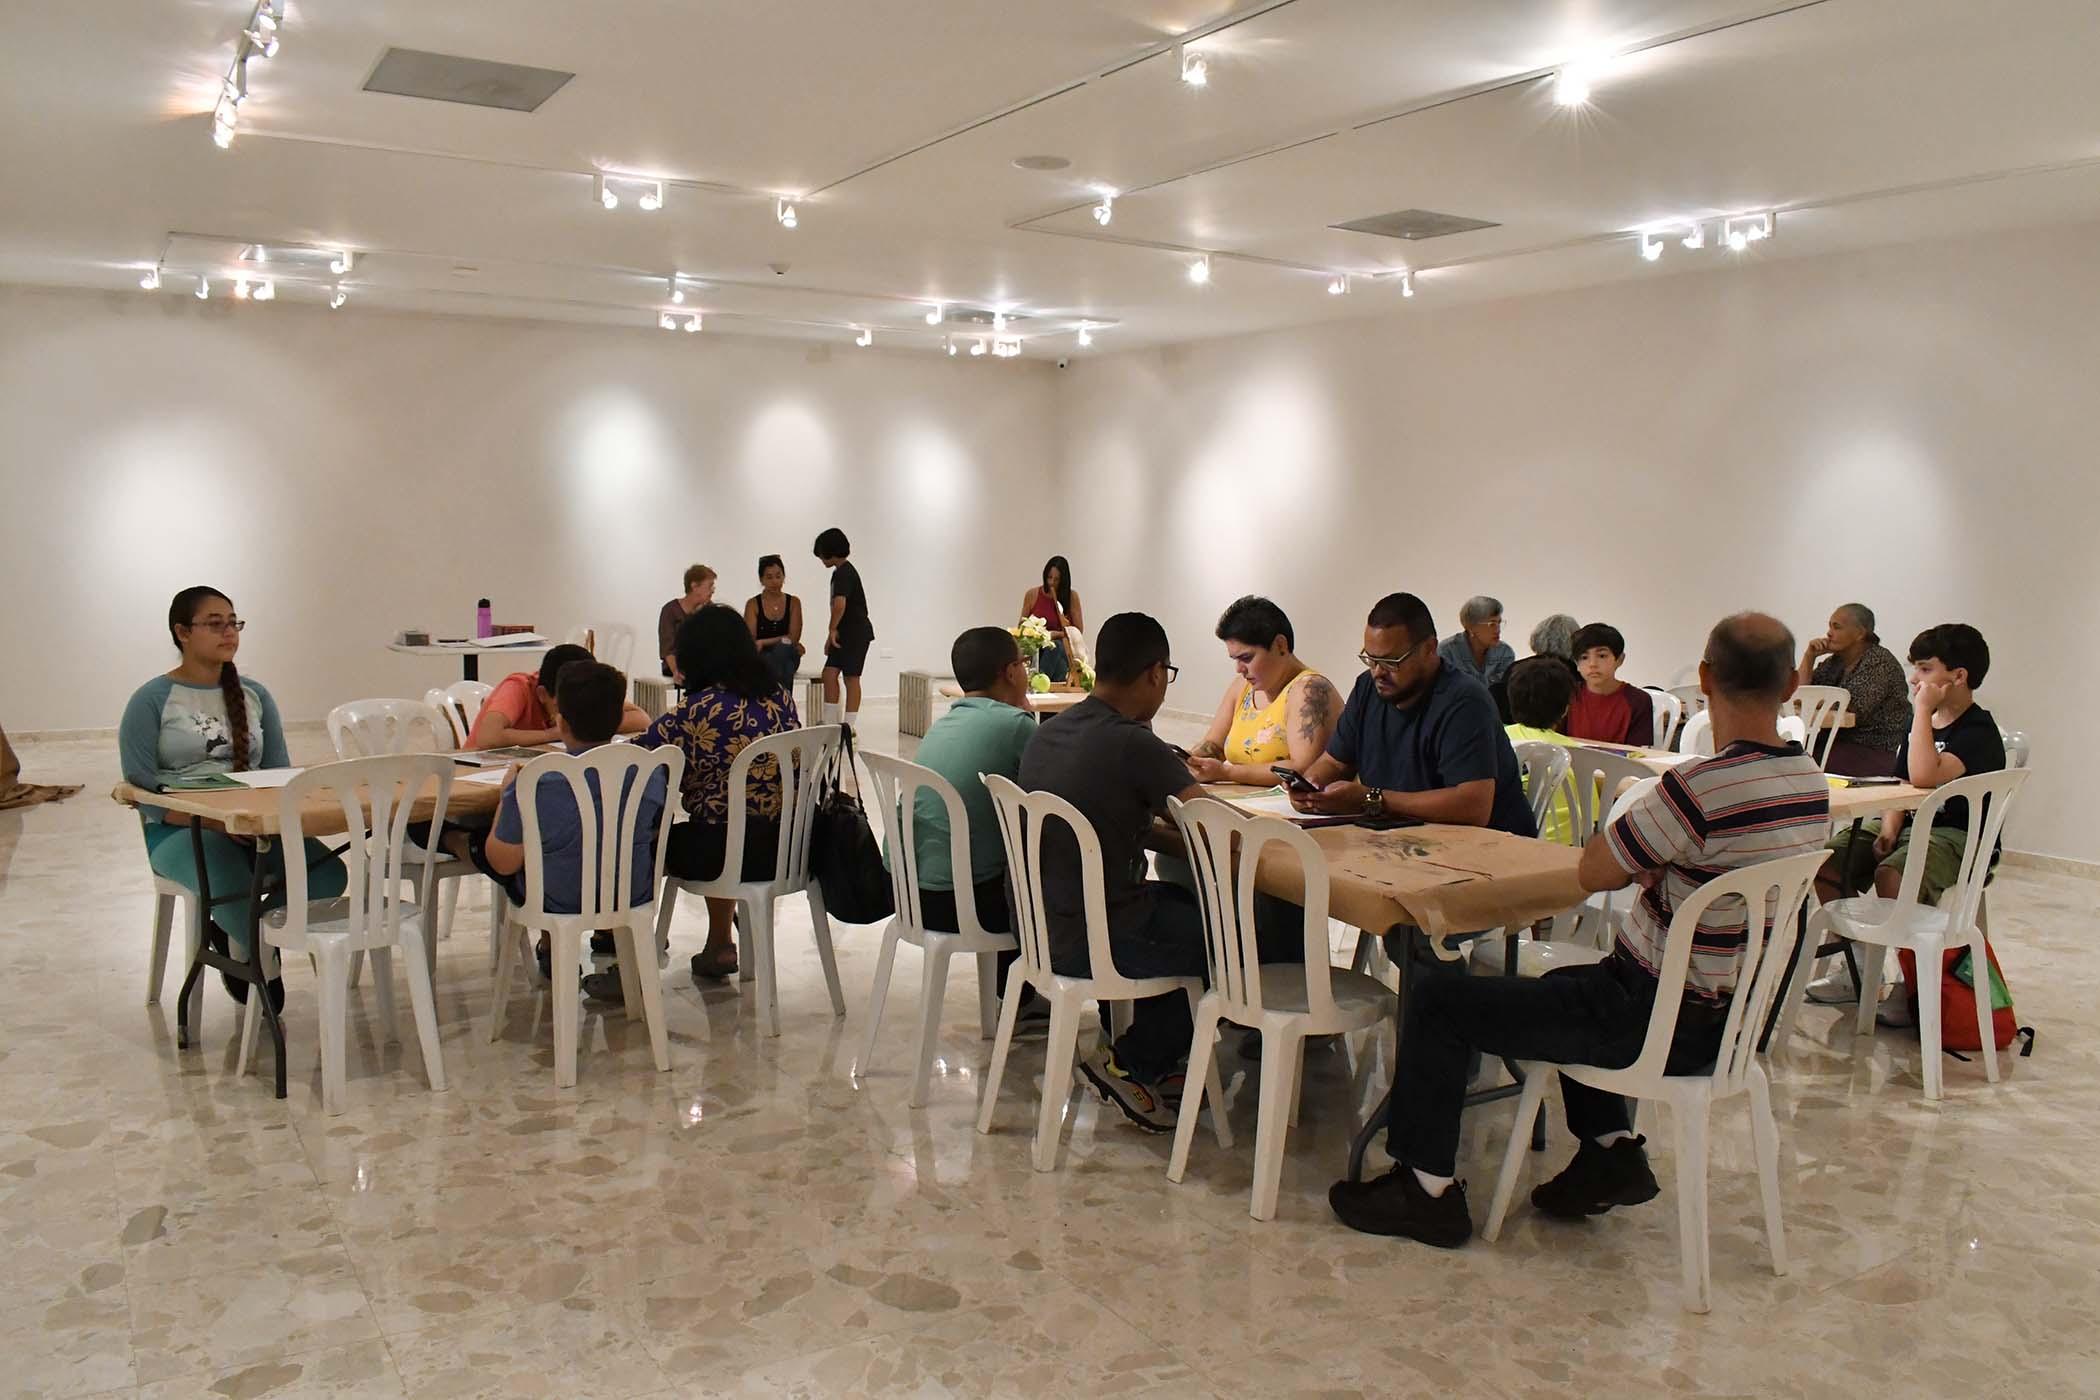 Participantes del Taller Bodegón en el Museo de Arte de Bayamón